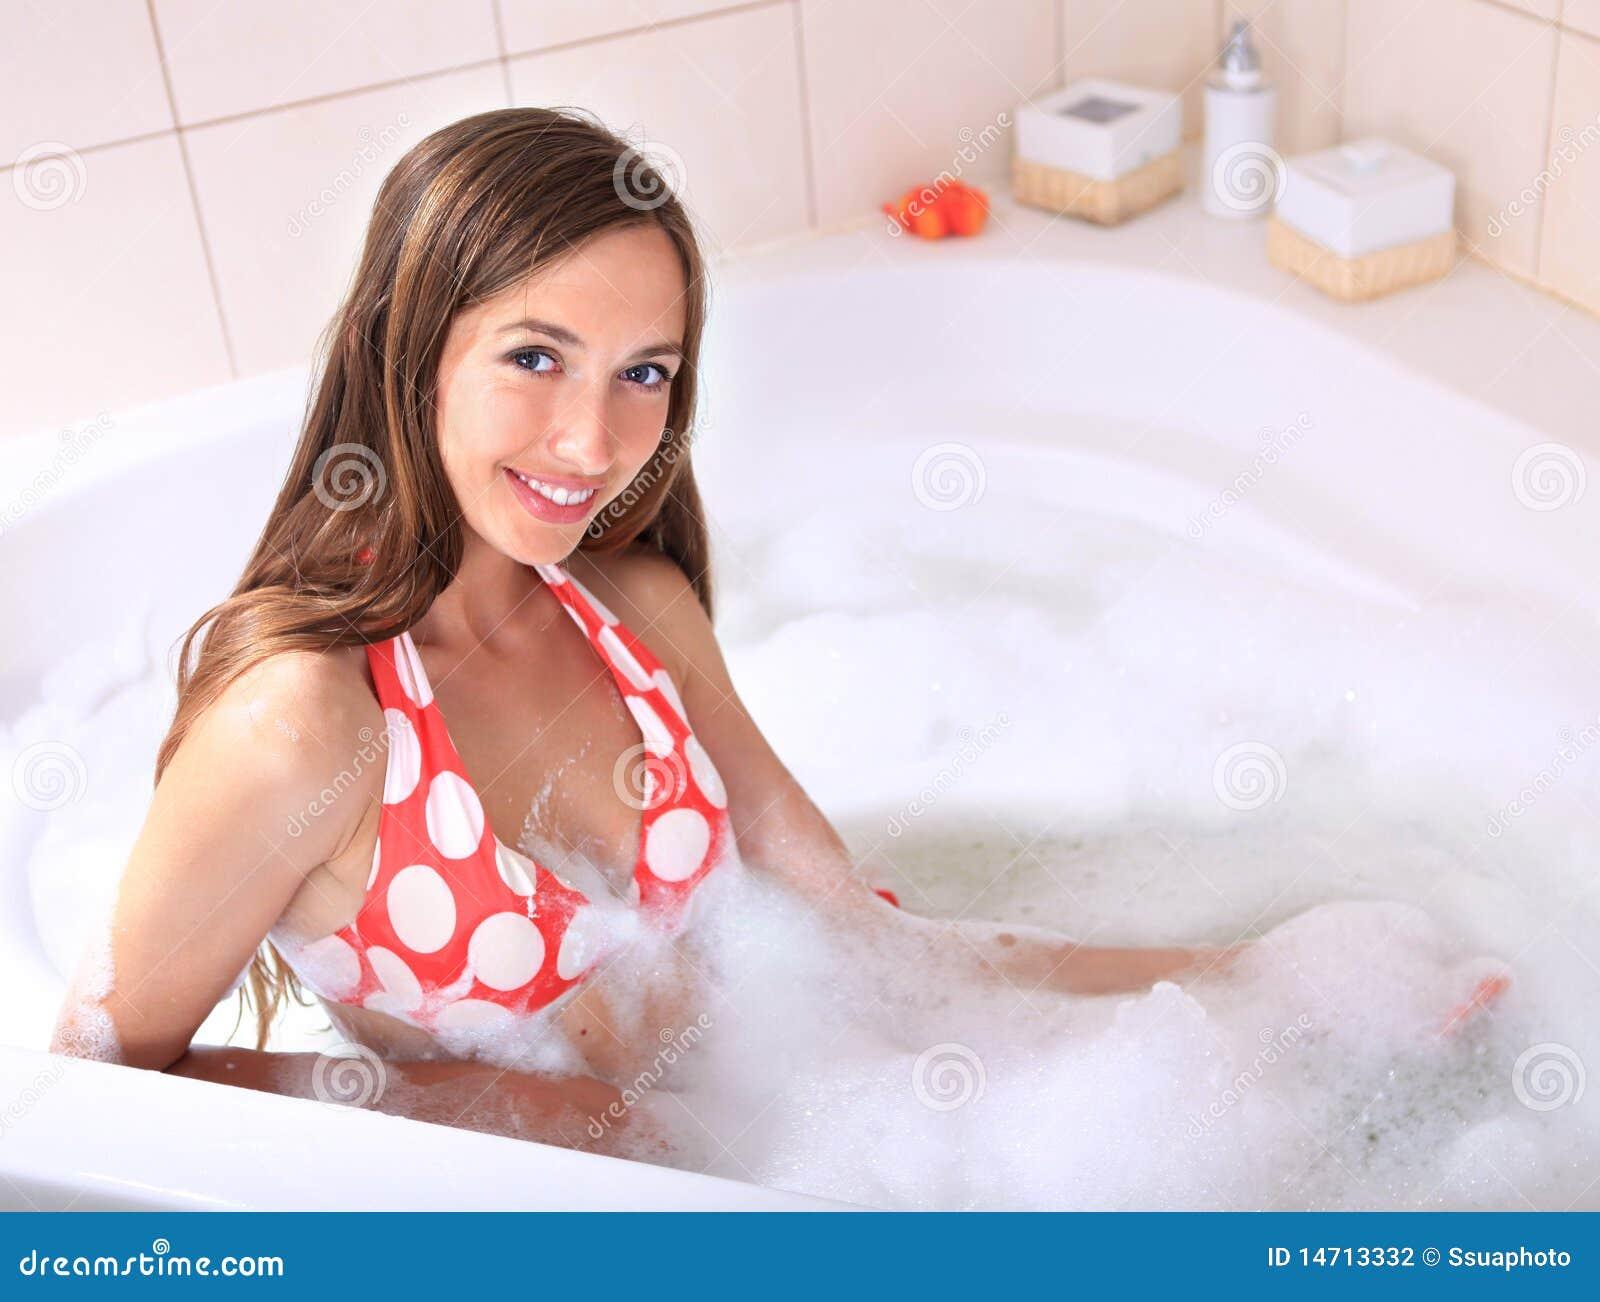 Woman takes tub